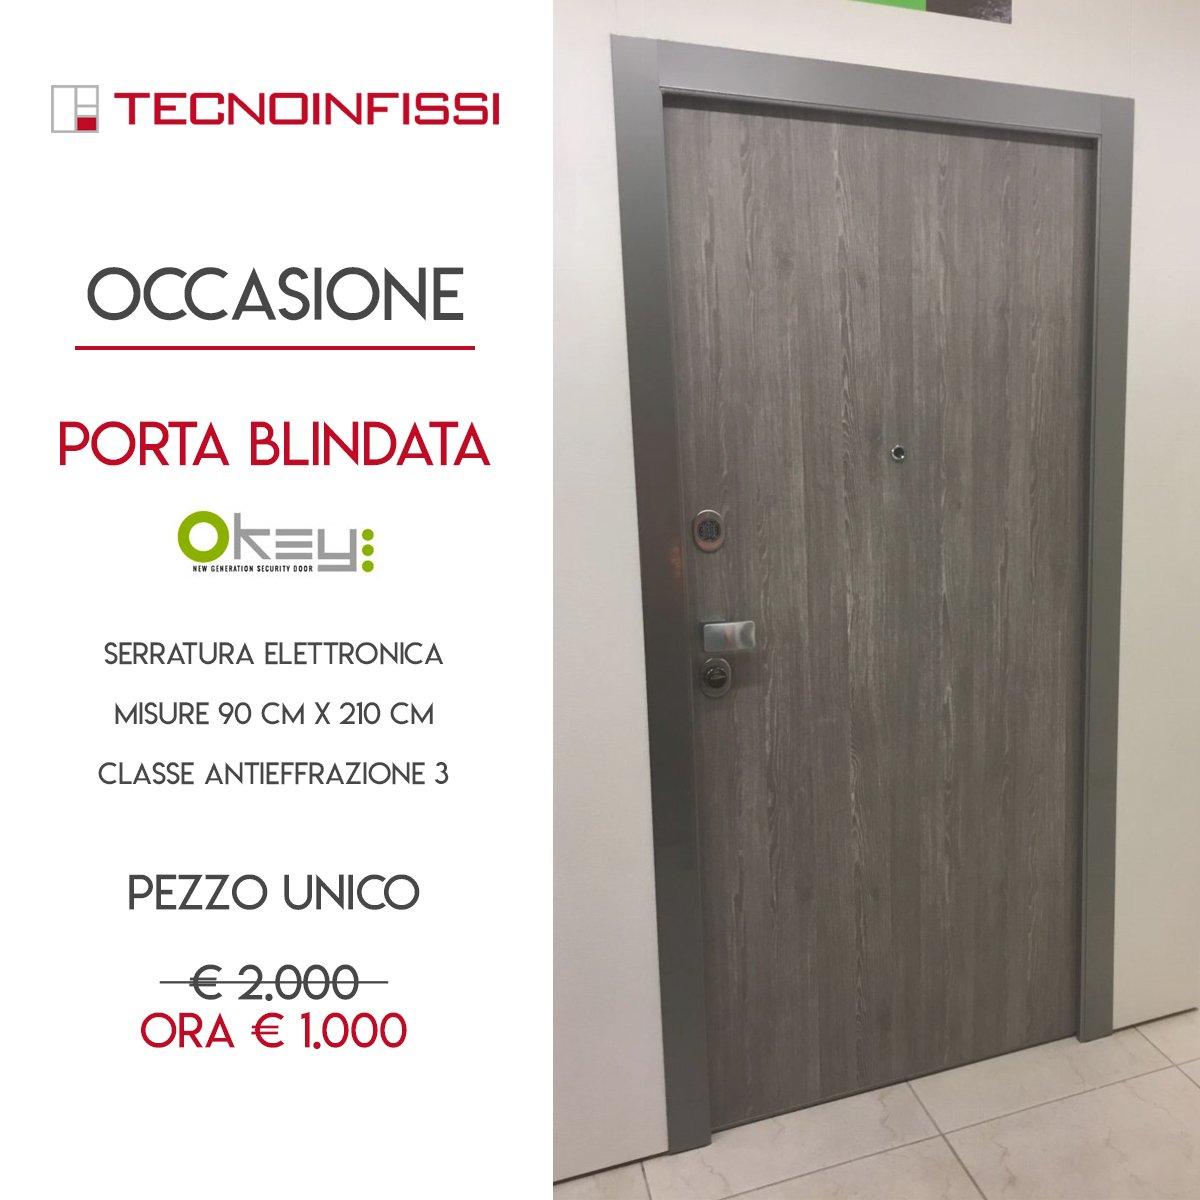 Offerta Porte Blindate per rinnovo campionatura - Tecnoinfissi Srl